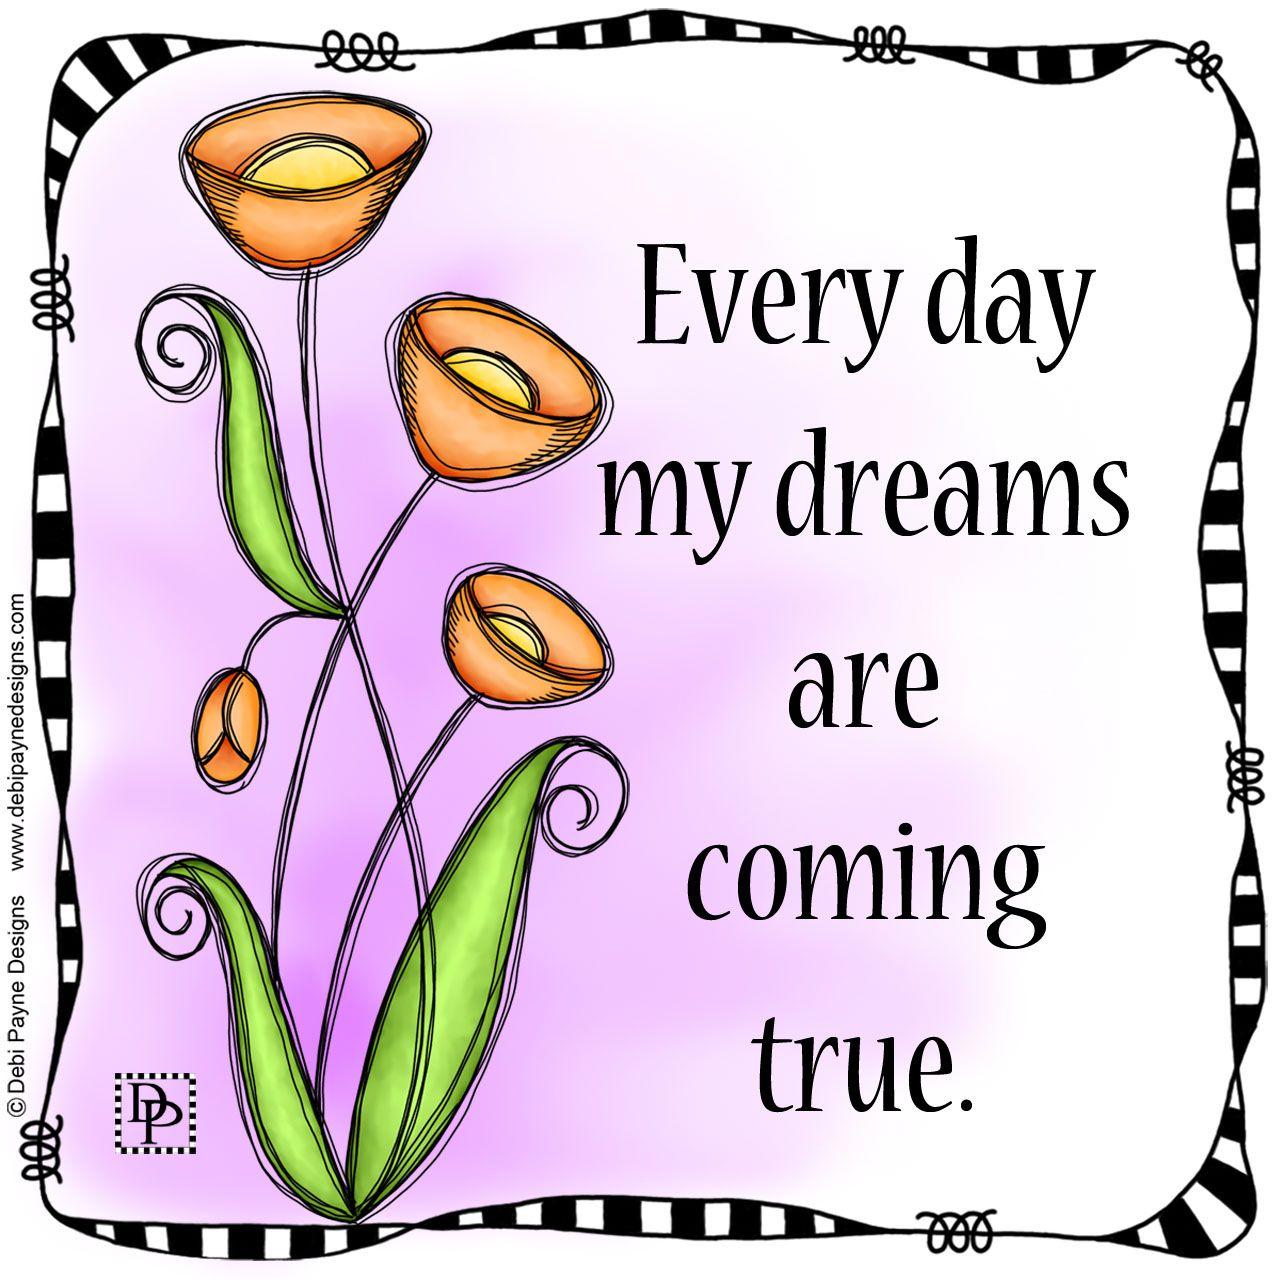 Yes My Dear Dreams Really Do Come True